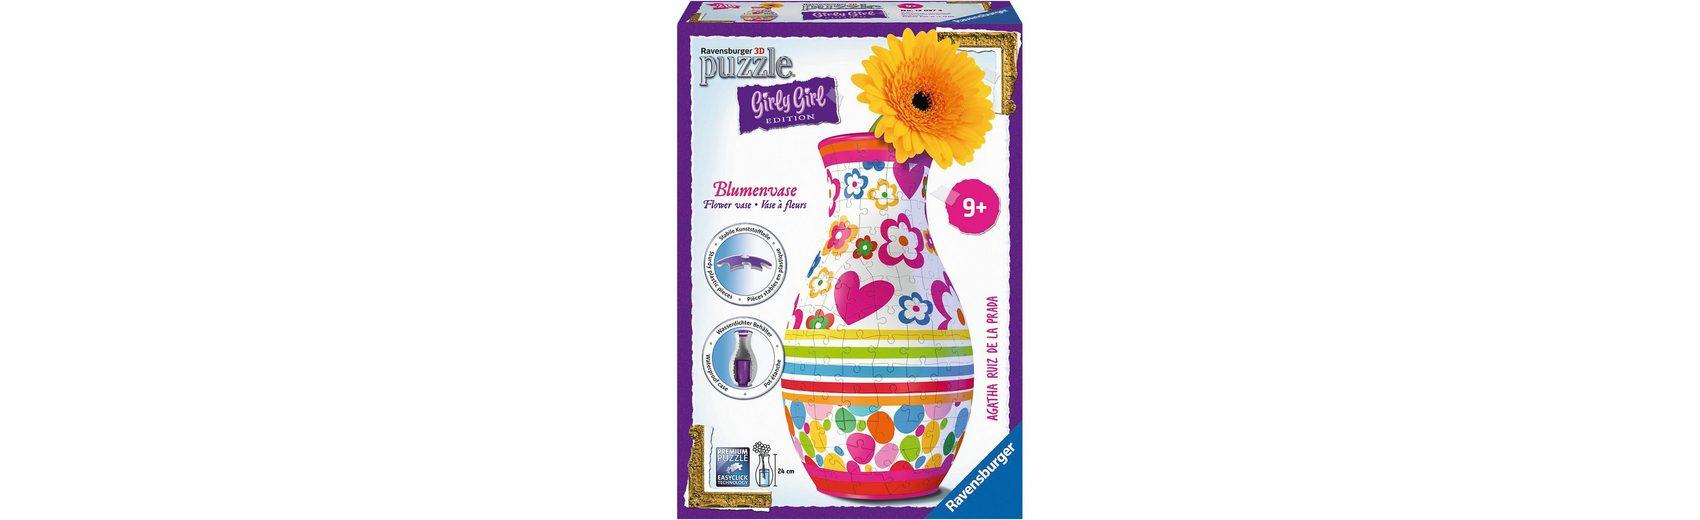 Ravensburger 3-D Puzzle Girly Girl Edition Blumenvase Agatha Ruiz de la P